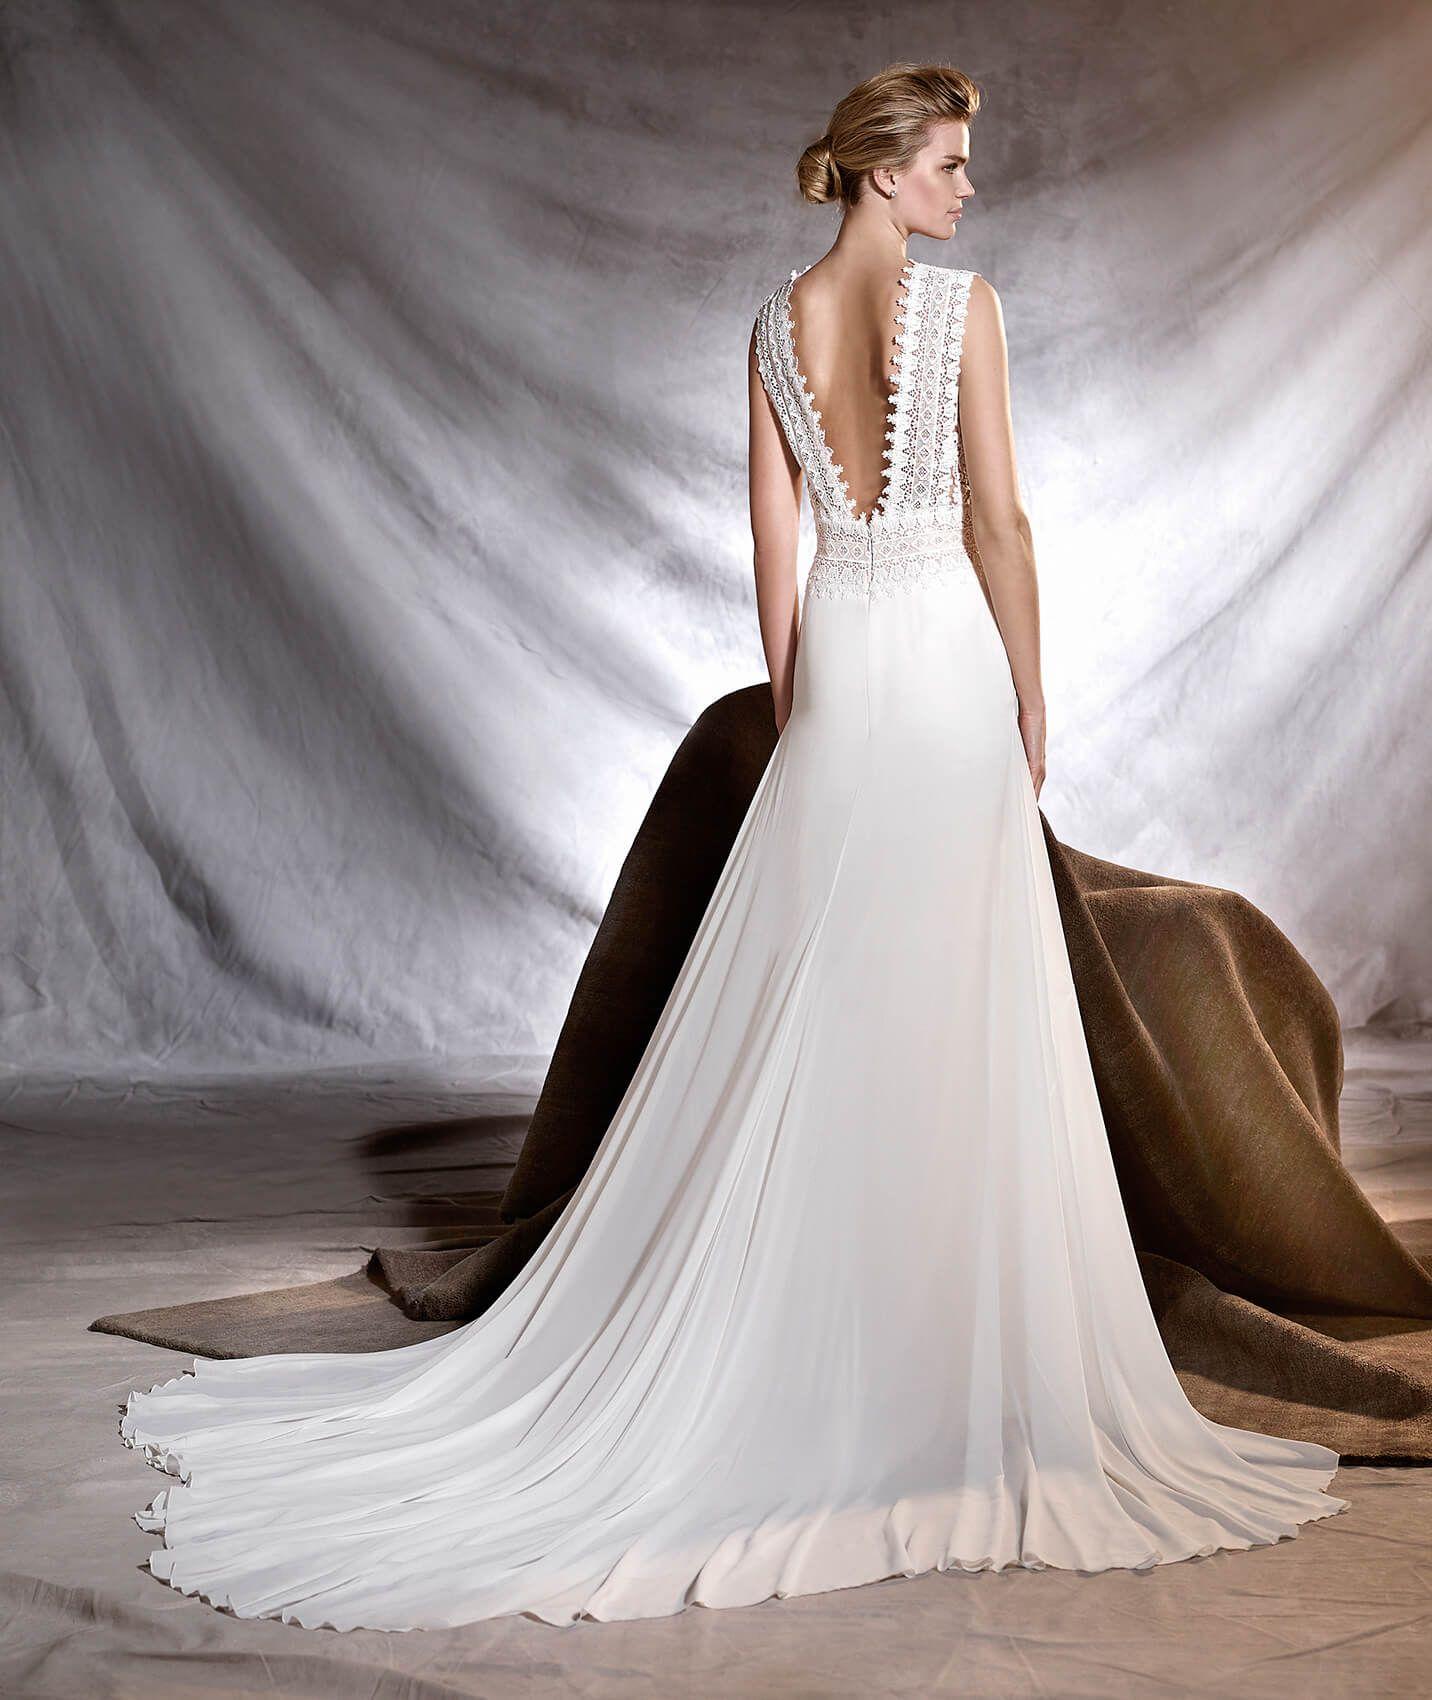 OROBIA - Robe de mariée en gaze, guipure et tulle | Wedding dress ...